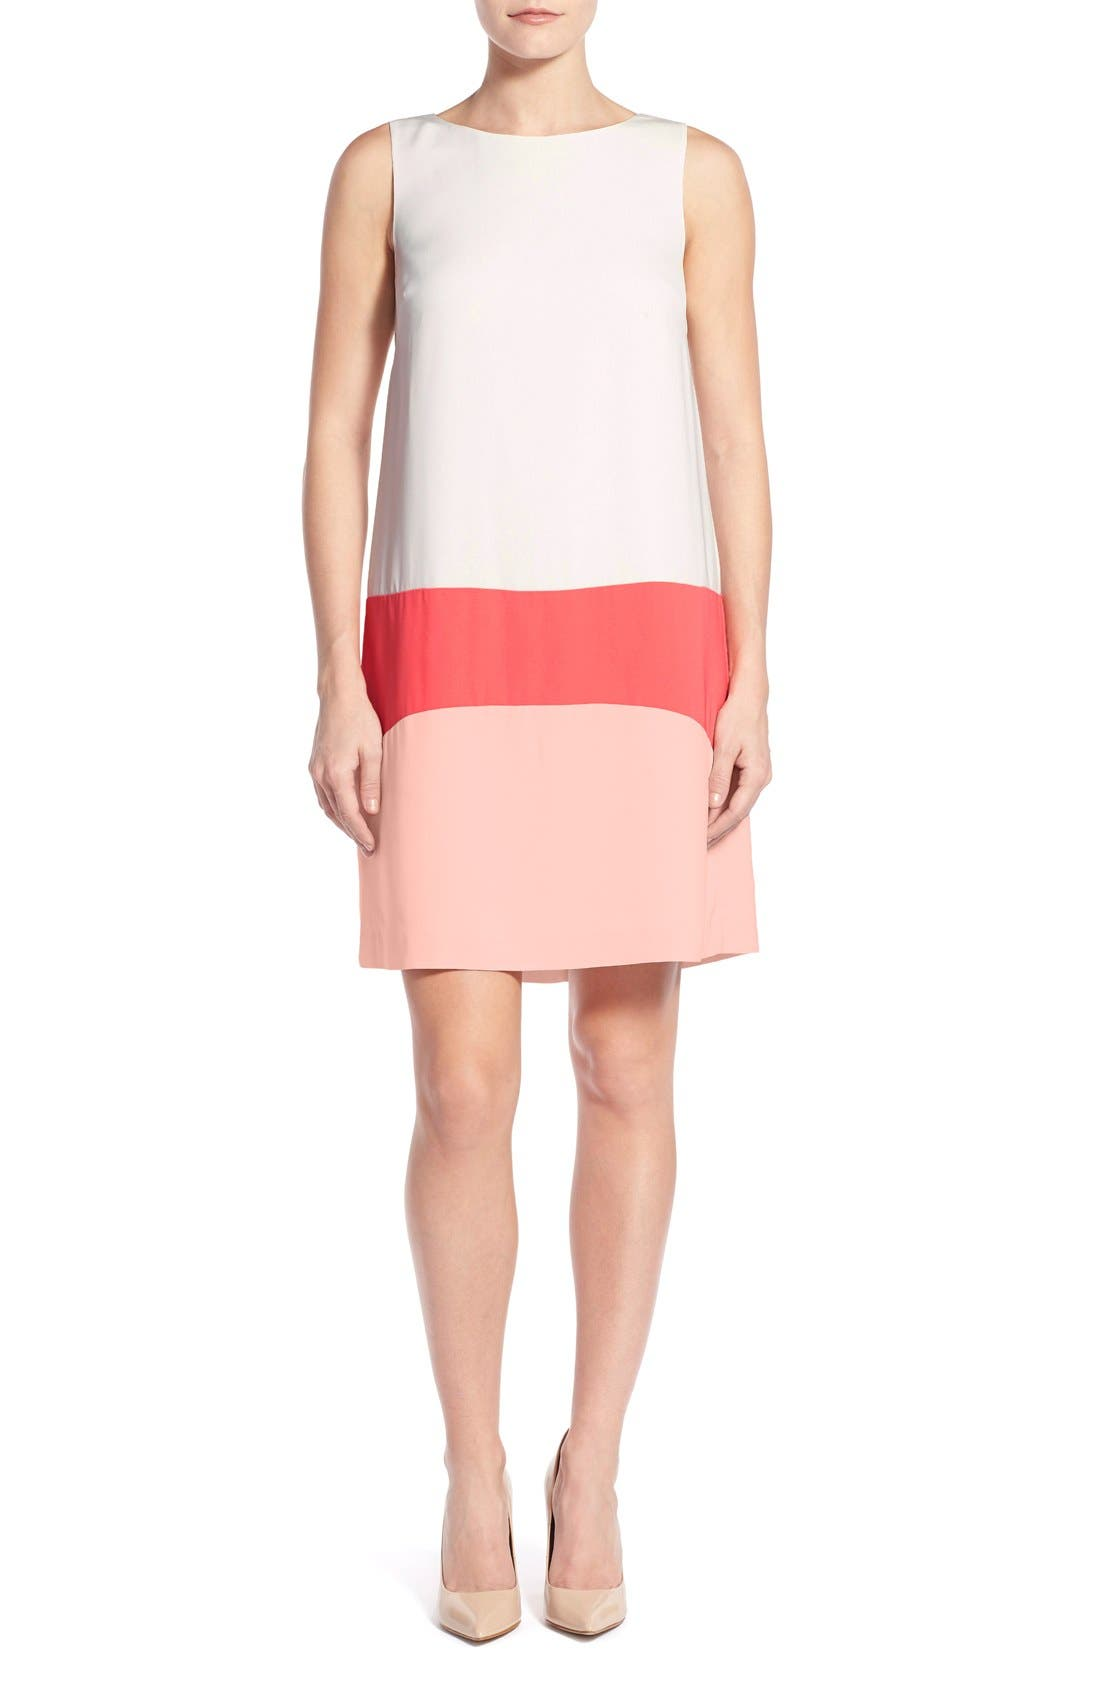 Alternate Image 1 Selected - Halogen® Colorblock Shift Dress (Regular & Petite)